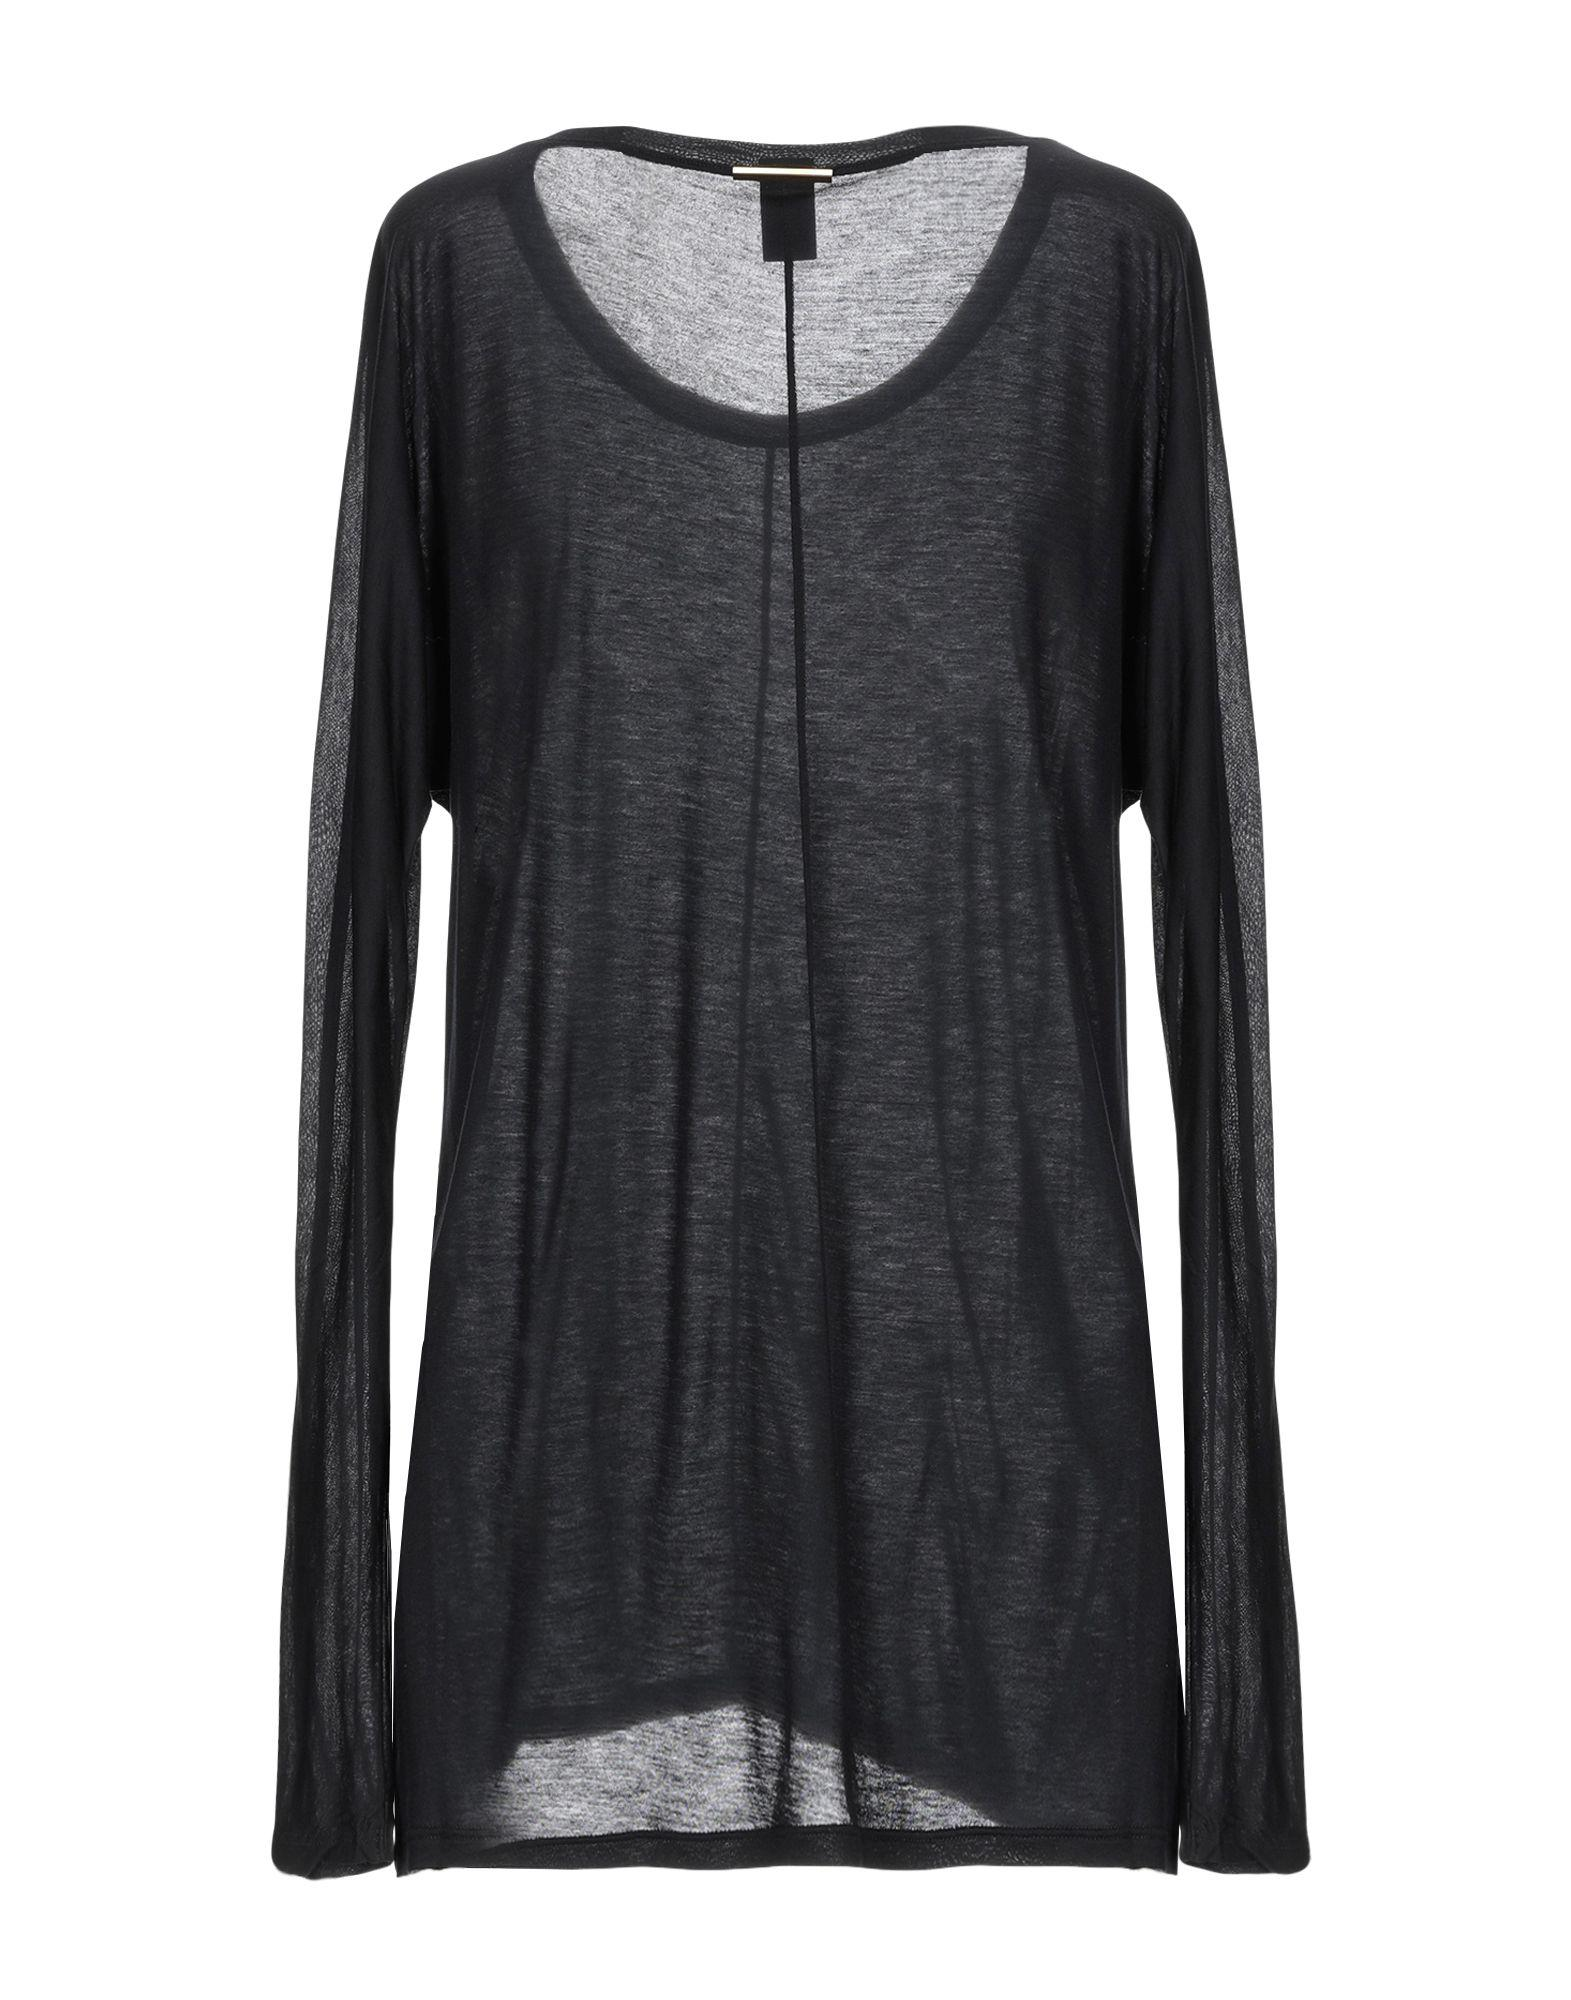 5098aeda34cf0 Lyst - Alexandre Vauthier T-shirt in Black